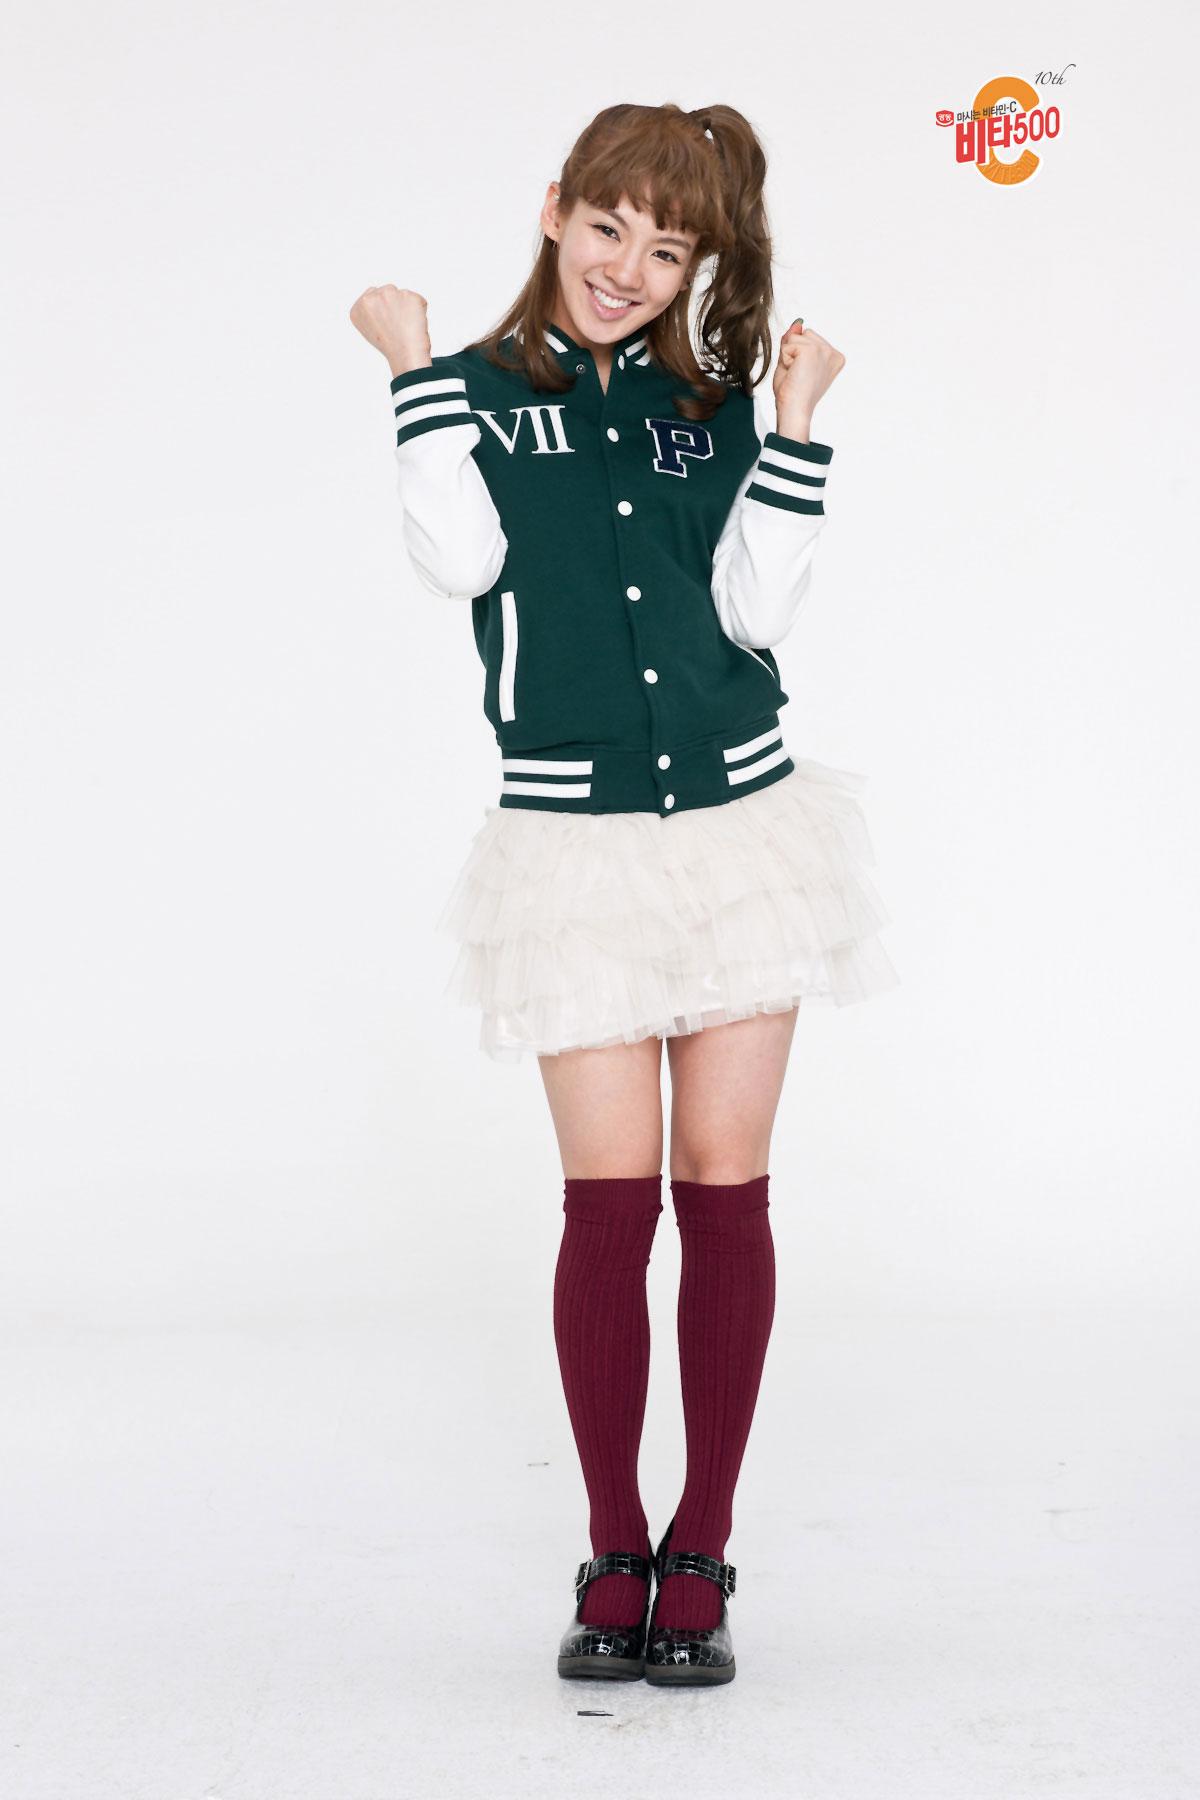 SNSD Hyoyeon Vita500 school